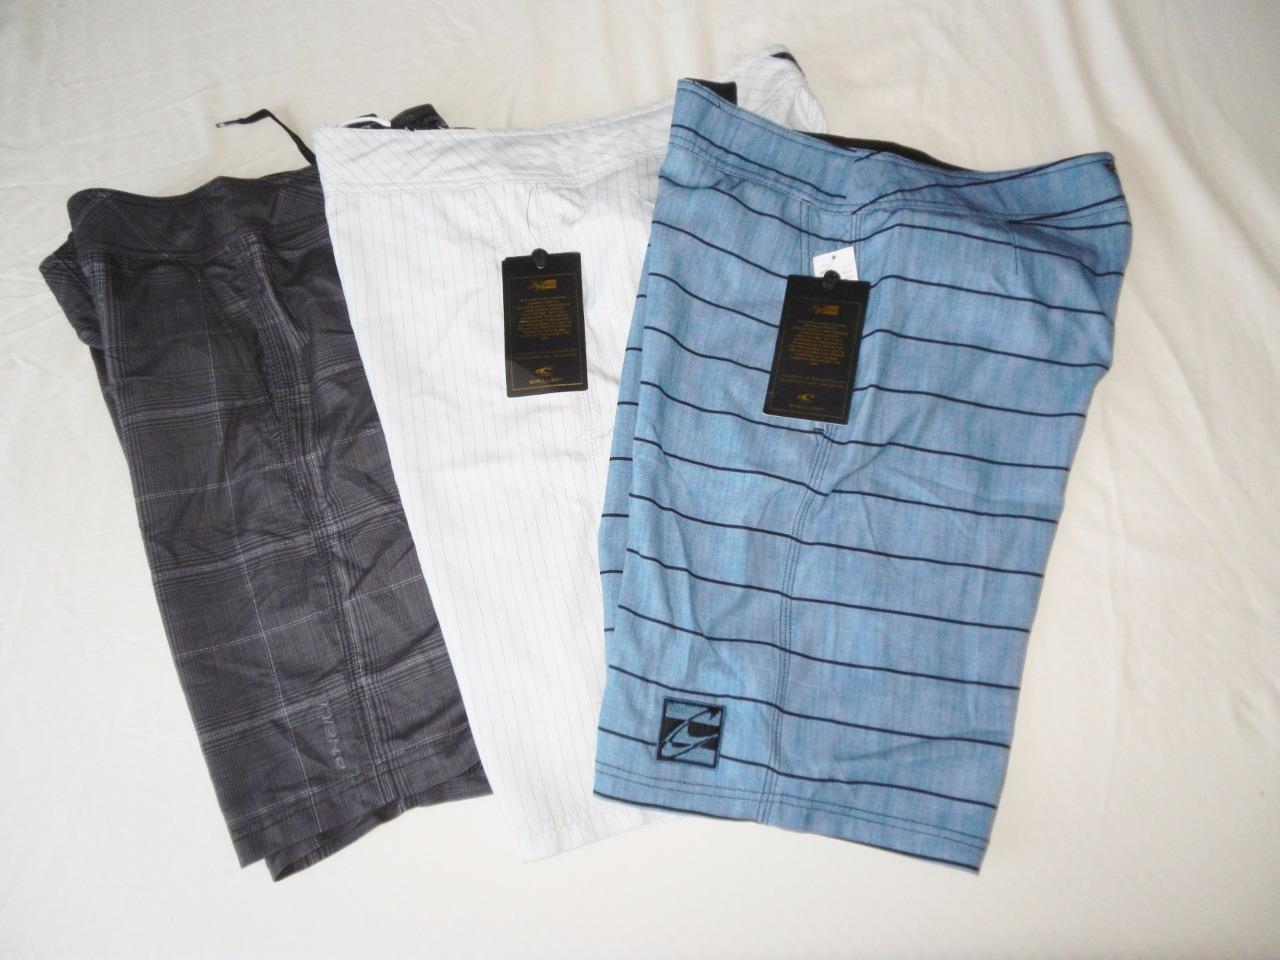 8b5d4d843a2a New Men s O Neill Hybrid Board Shorts - Sizes 30